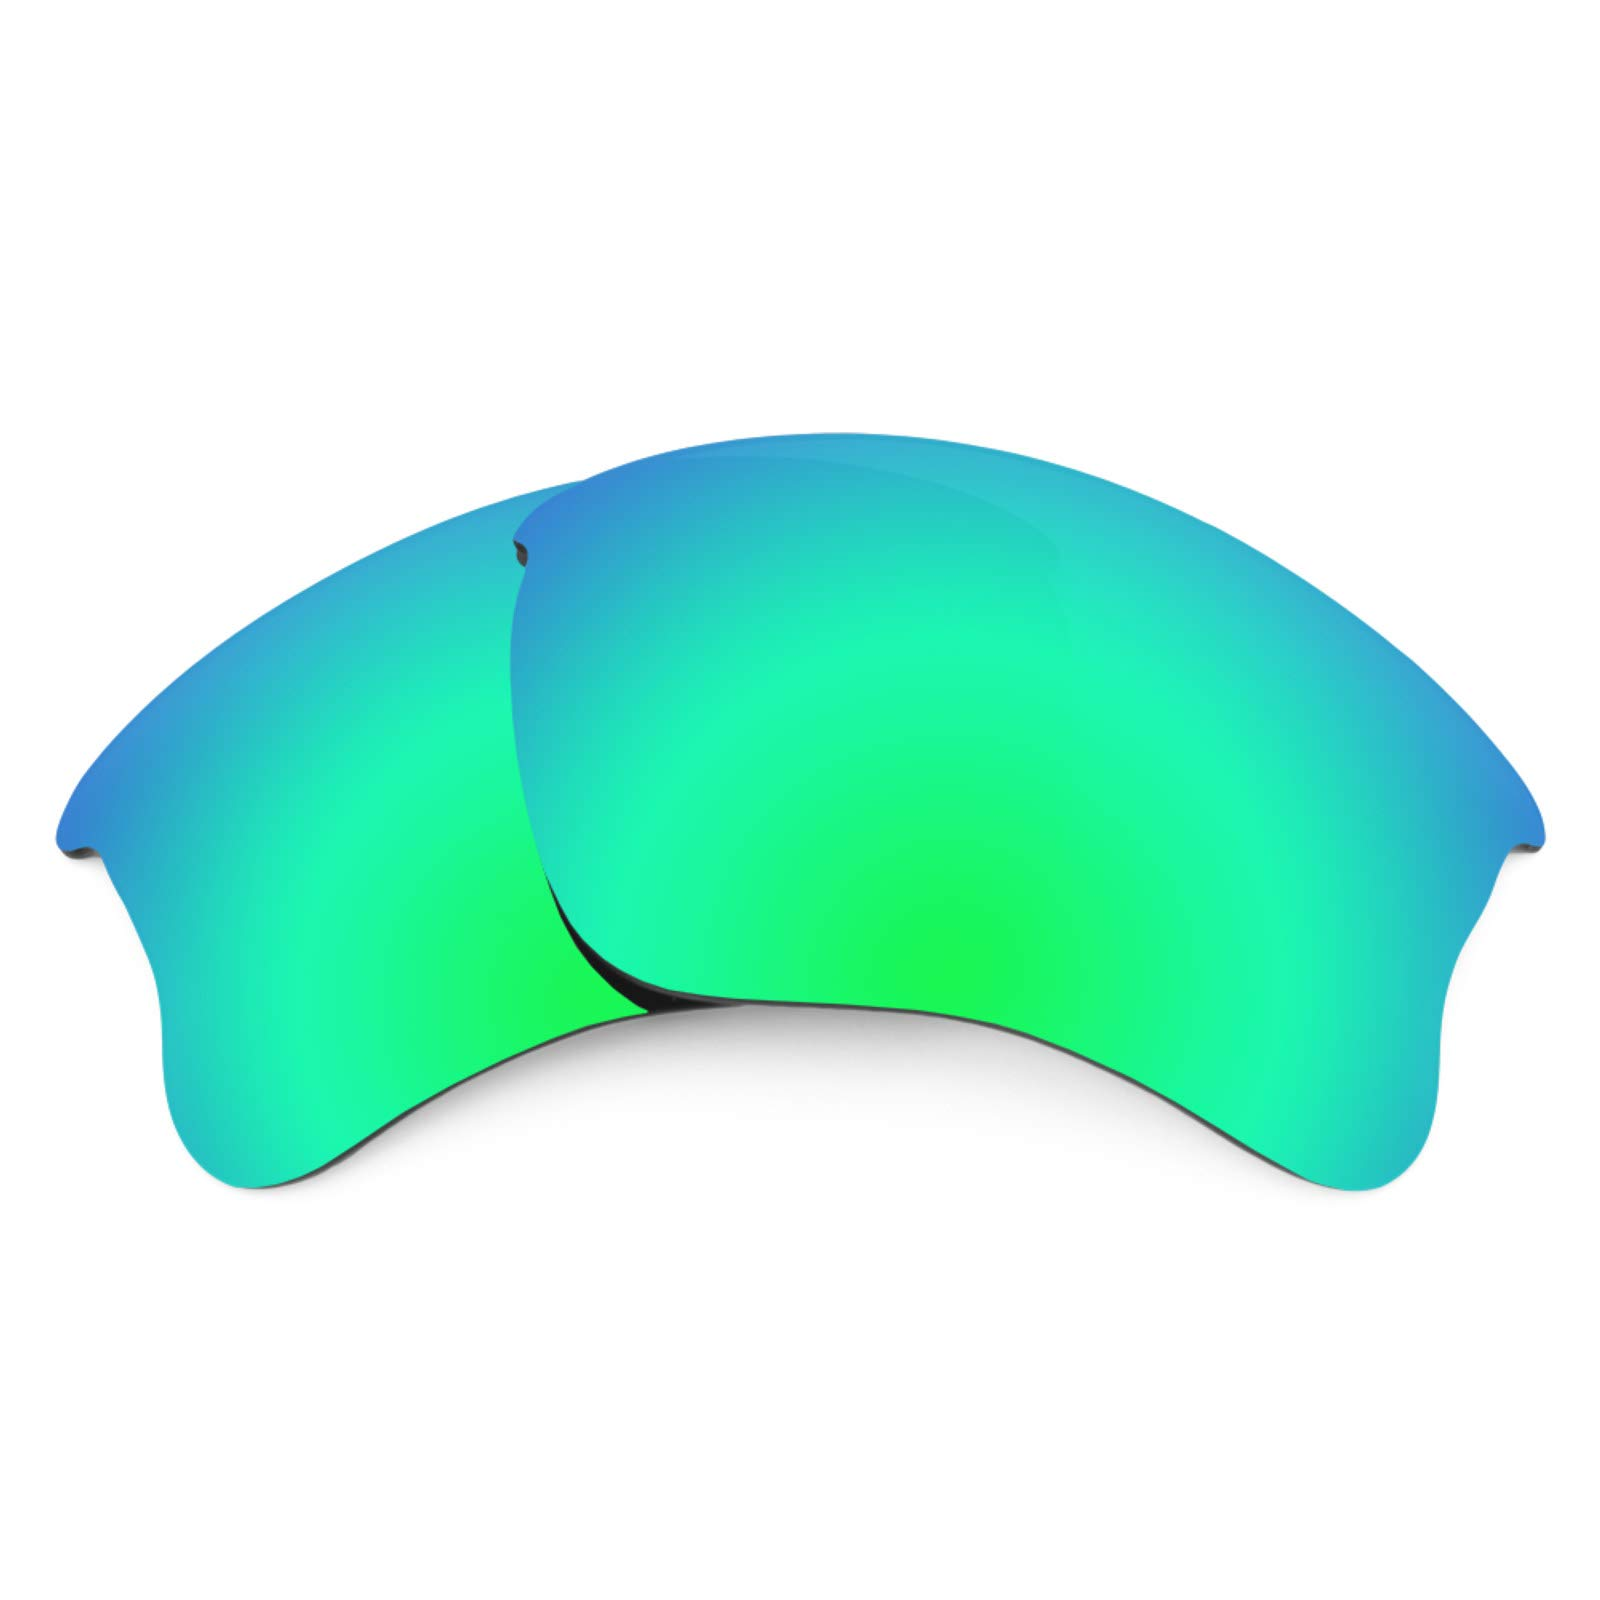 Revant Polarized Replacement Lenses for Oakley Flak Jacket XLJ (Asian Fit) Emerald Green MirrorShield